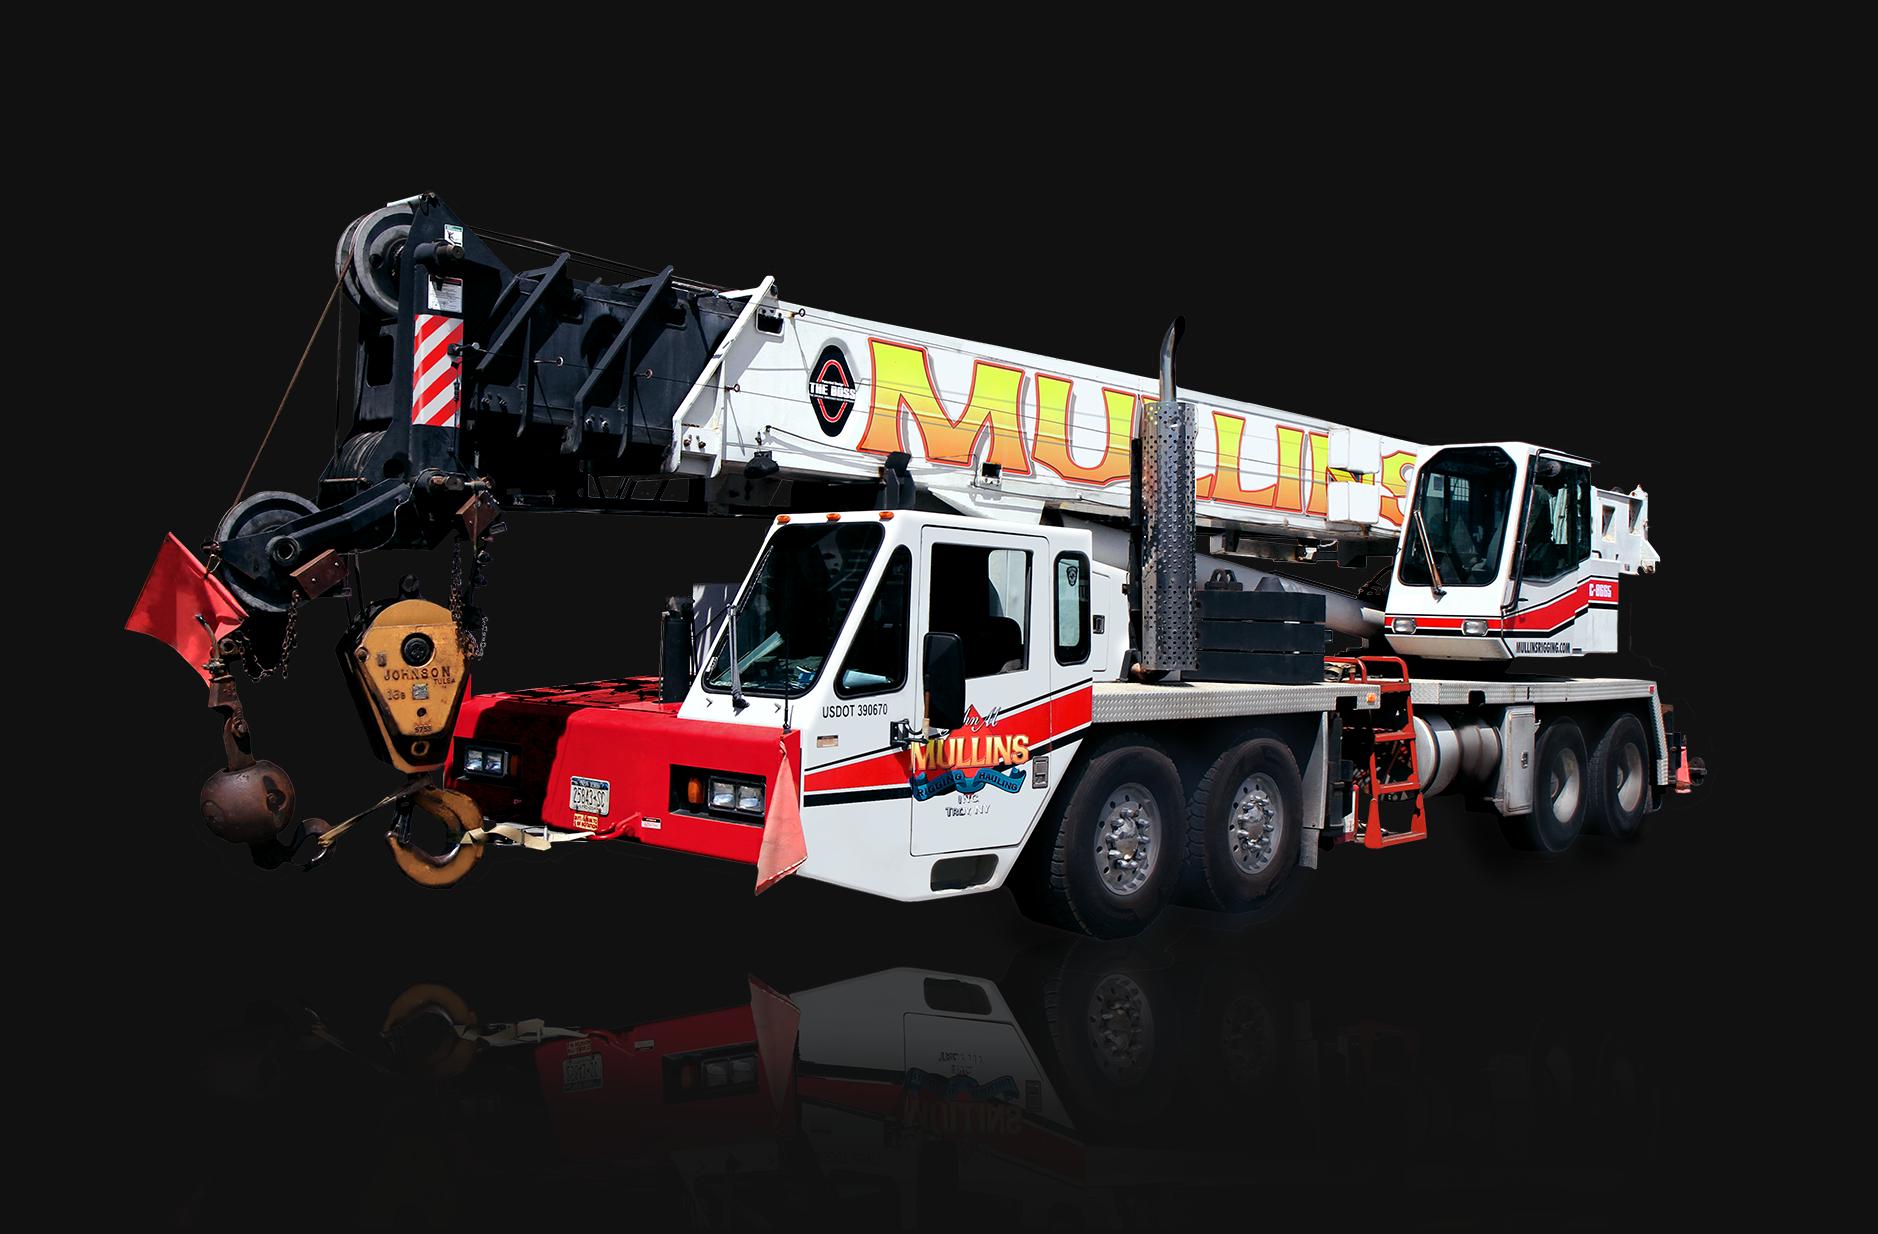 Mullins Rigging Crane 1HTC8665